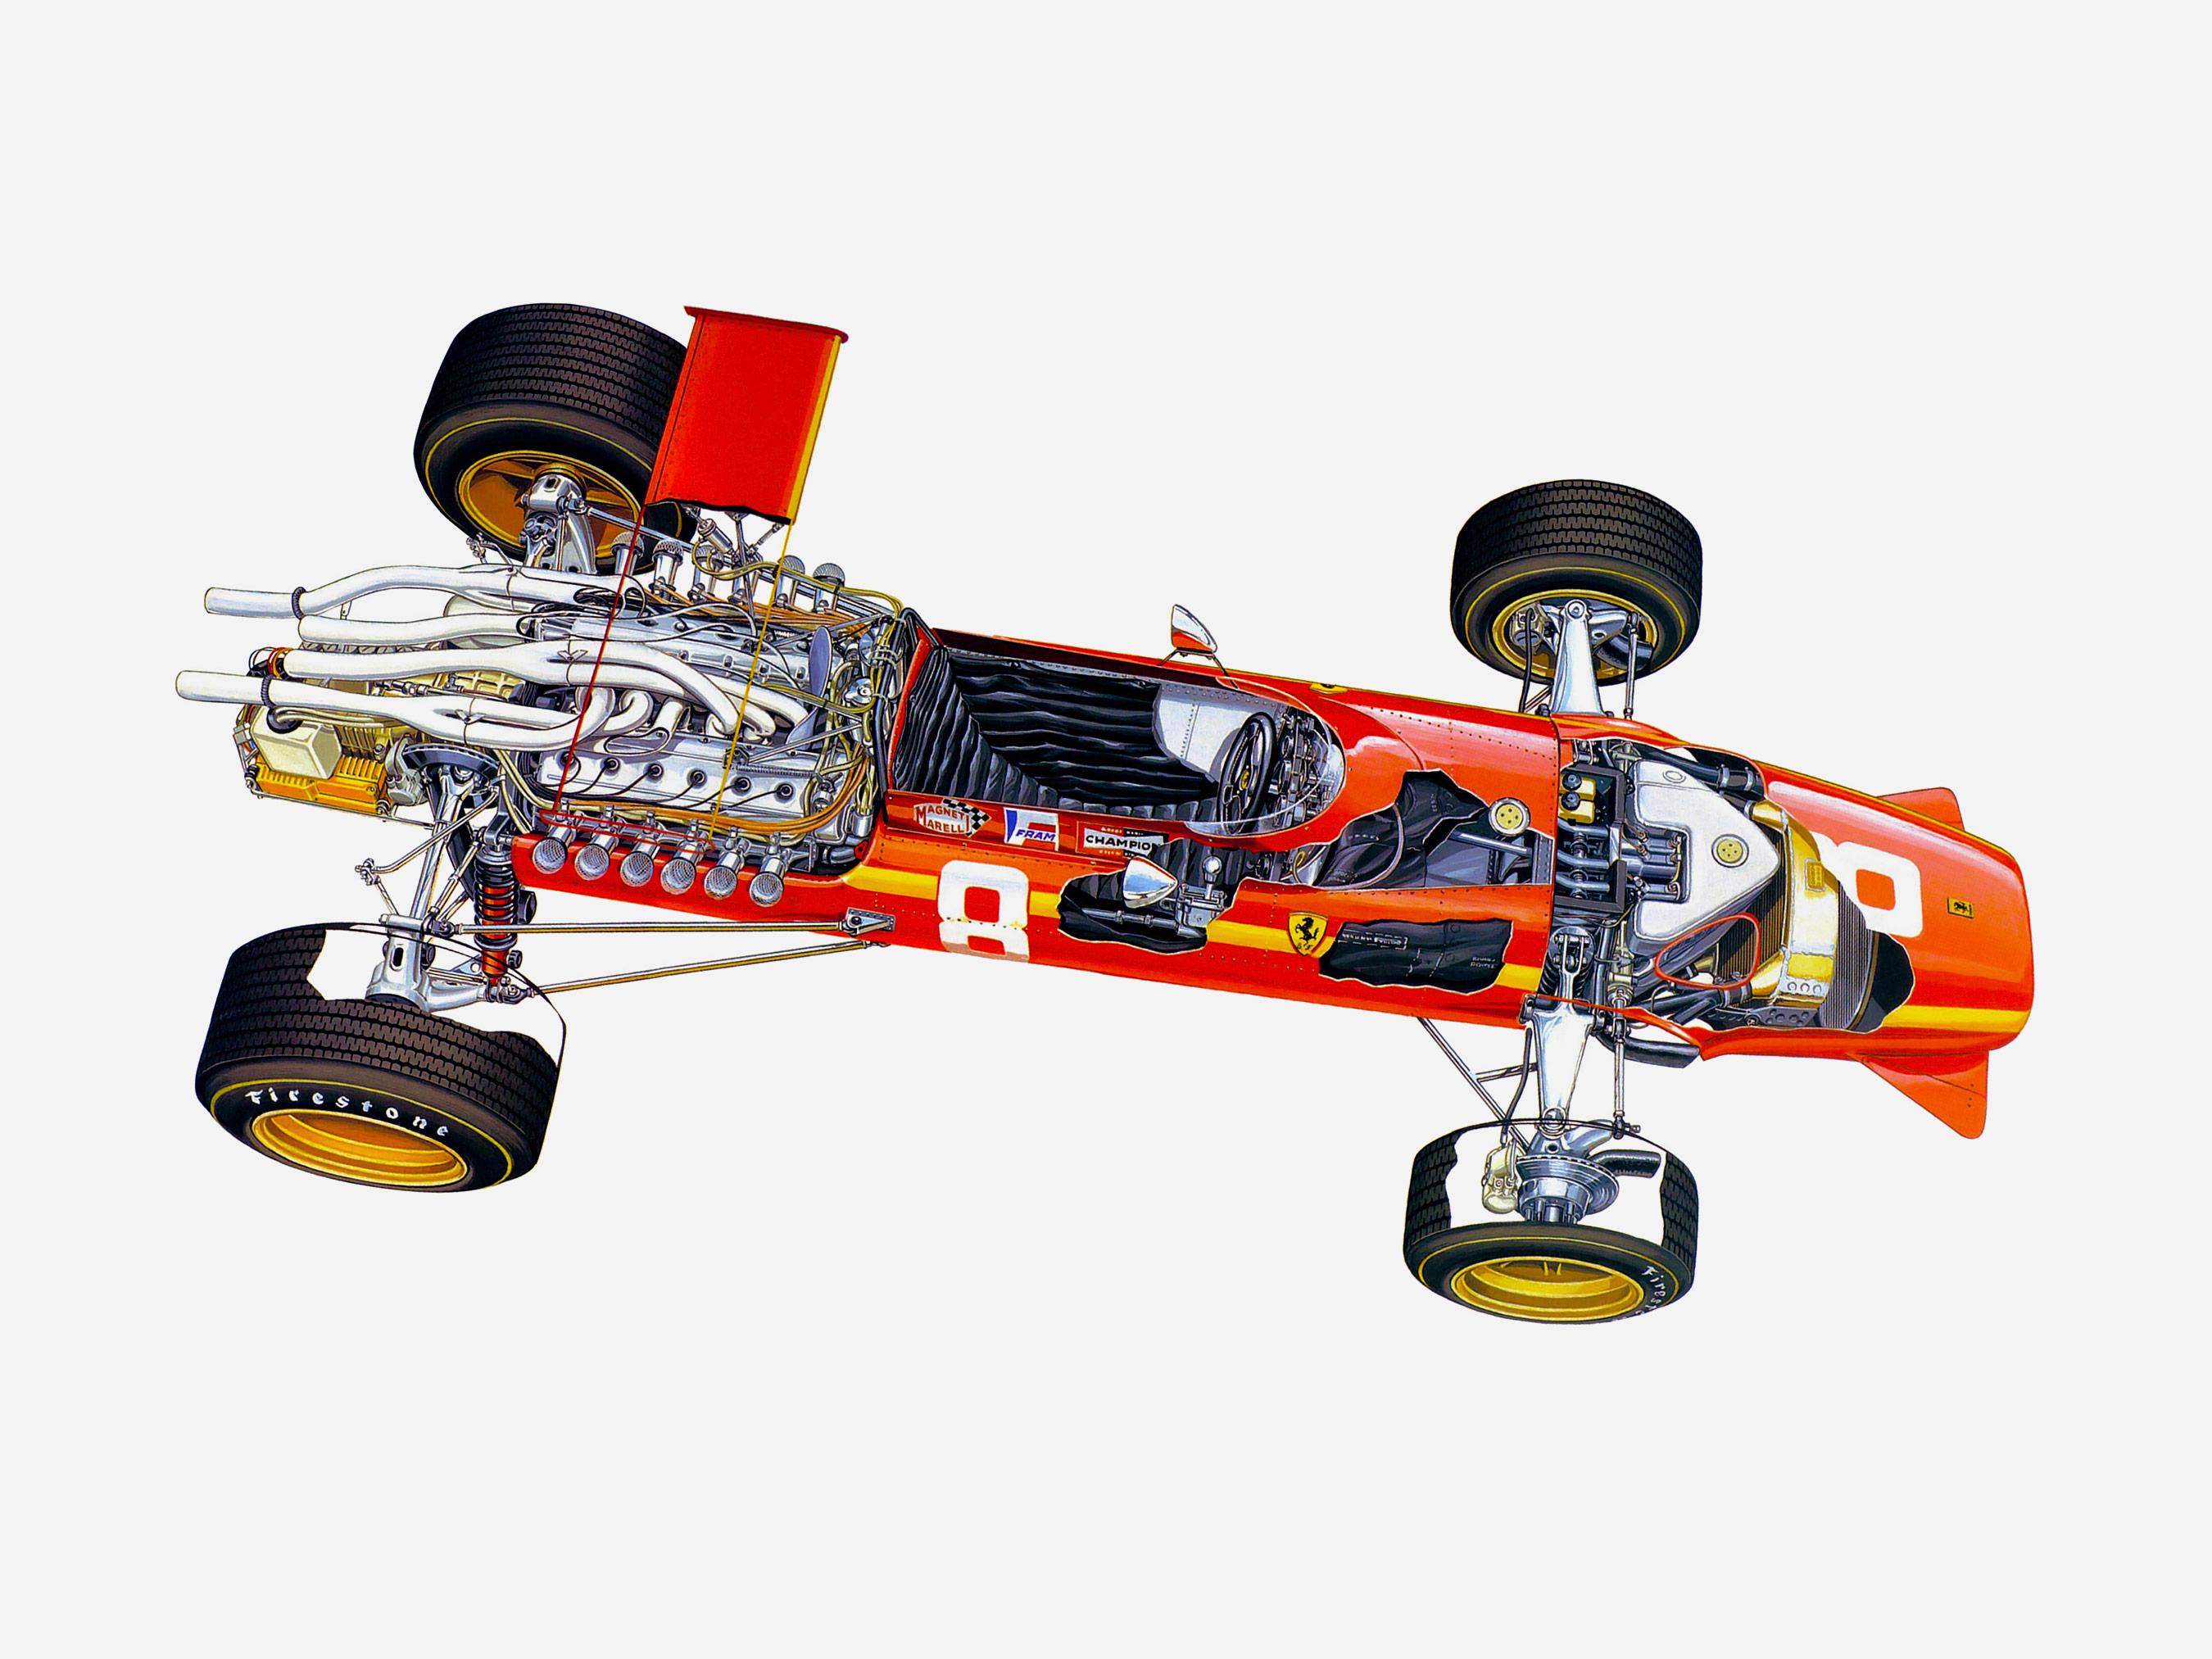 Ferrari 312 cutaway